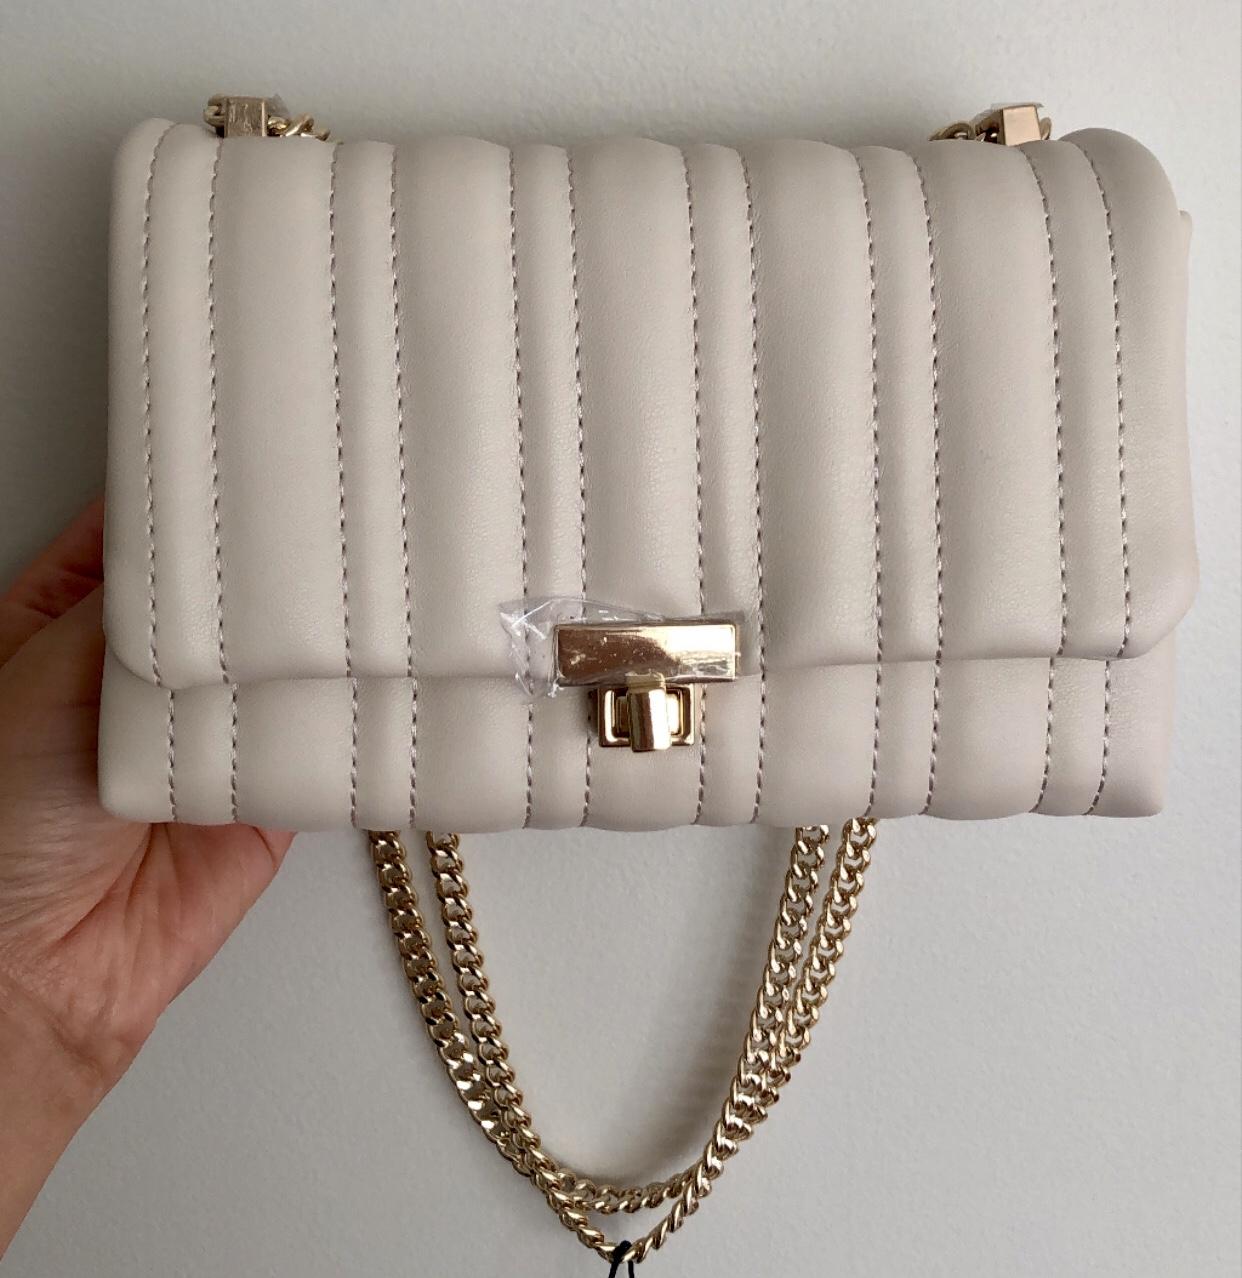 Zara Quilted Mini Crossbody Bag (ref. no. 6608/610)